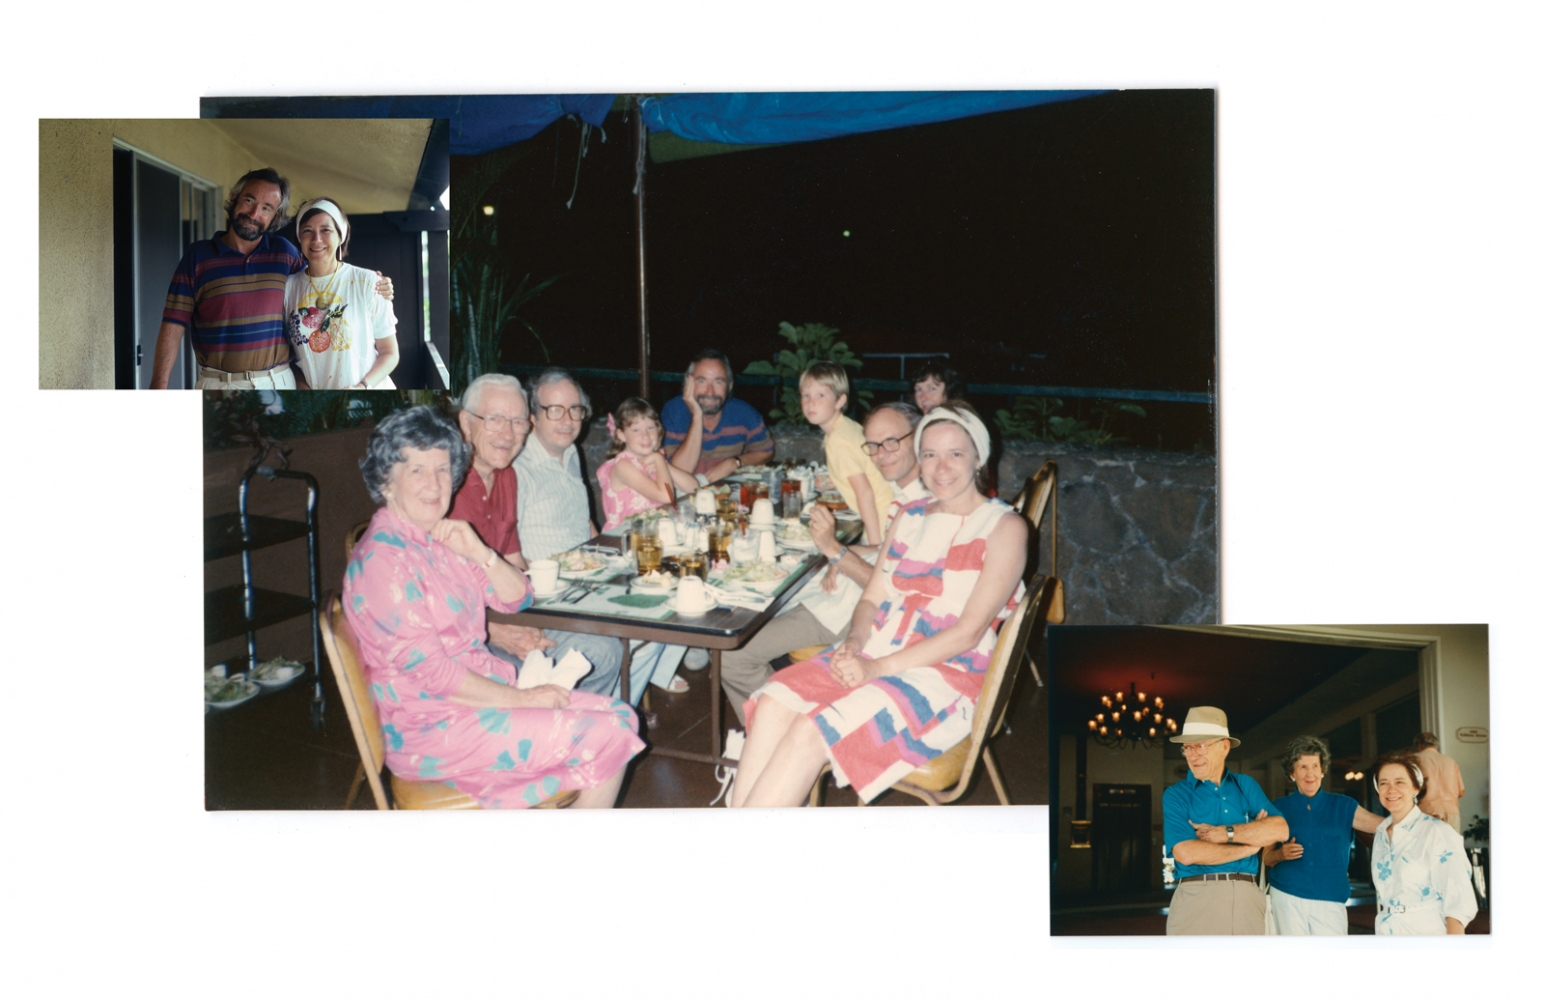 Nell and Paul's 50th wedding anniversary, Hawaii